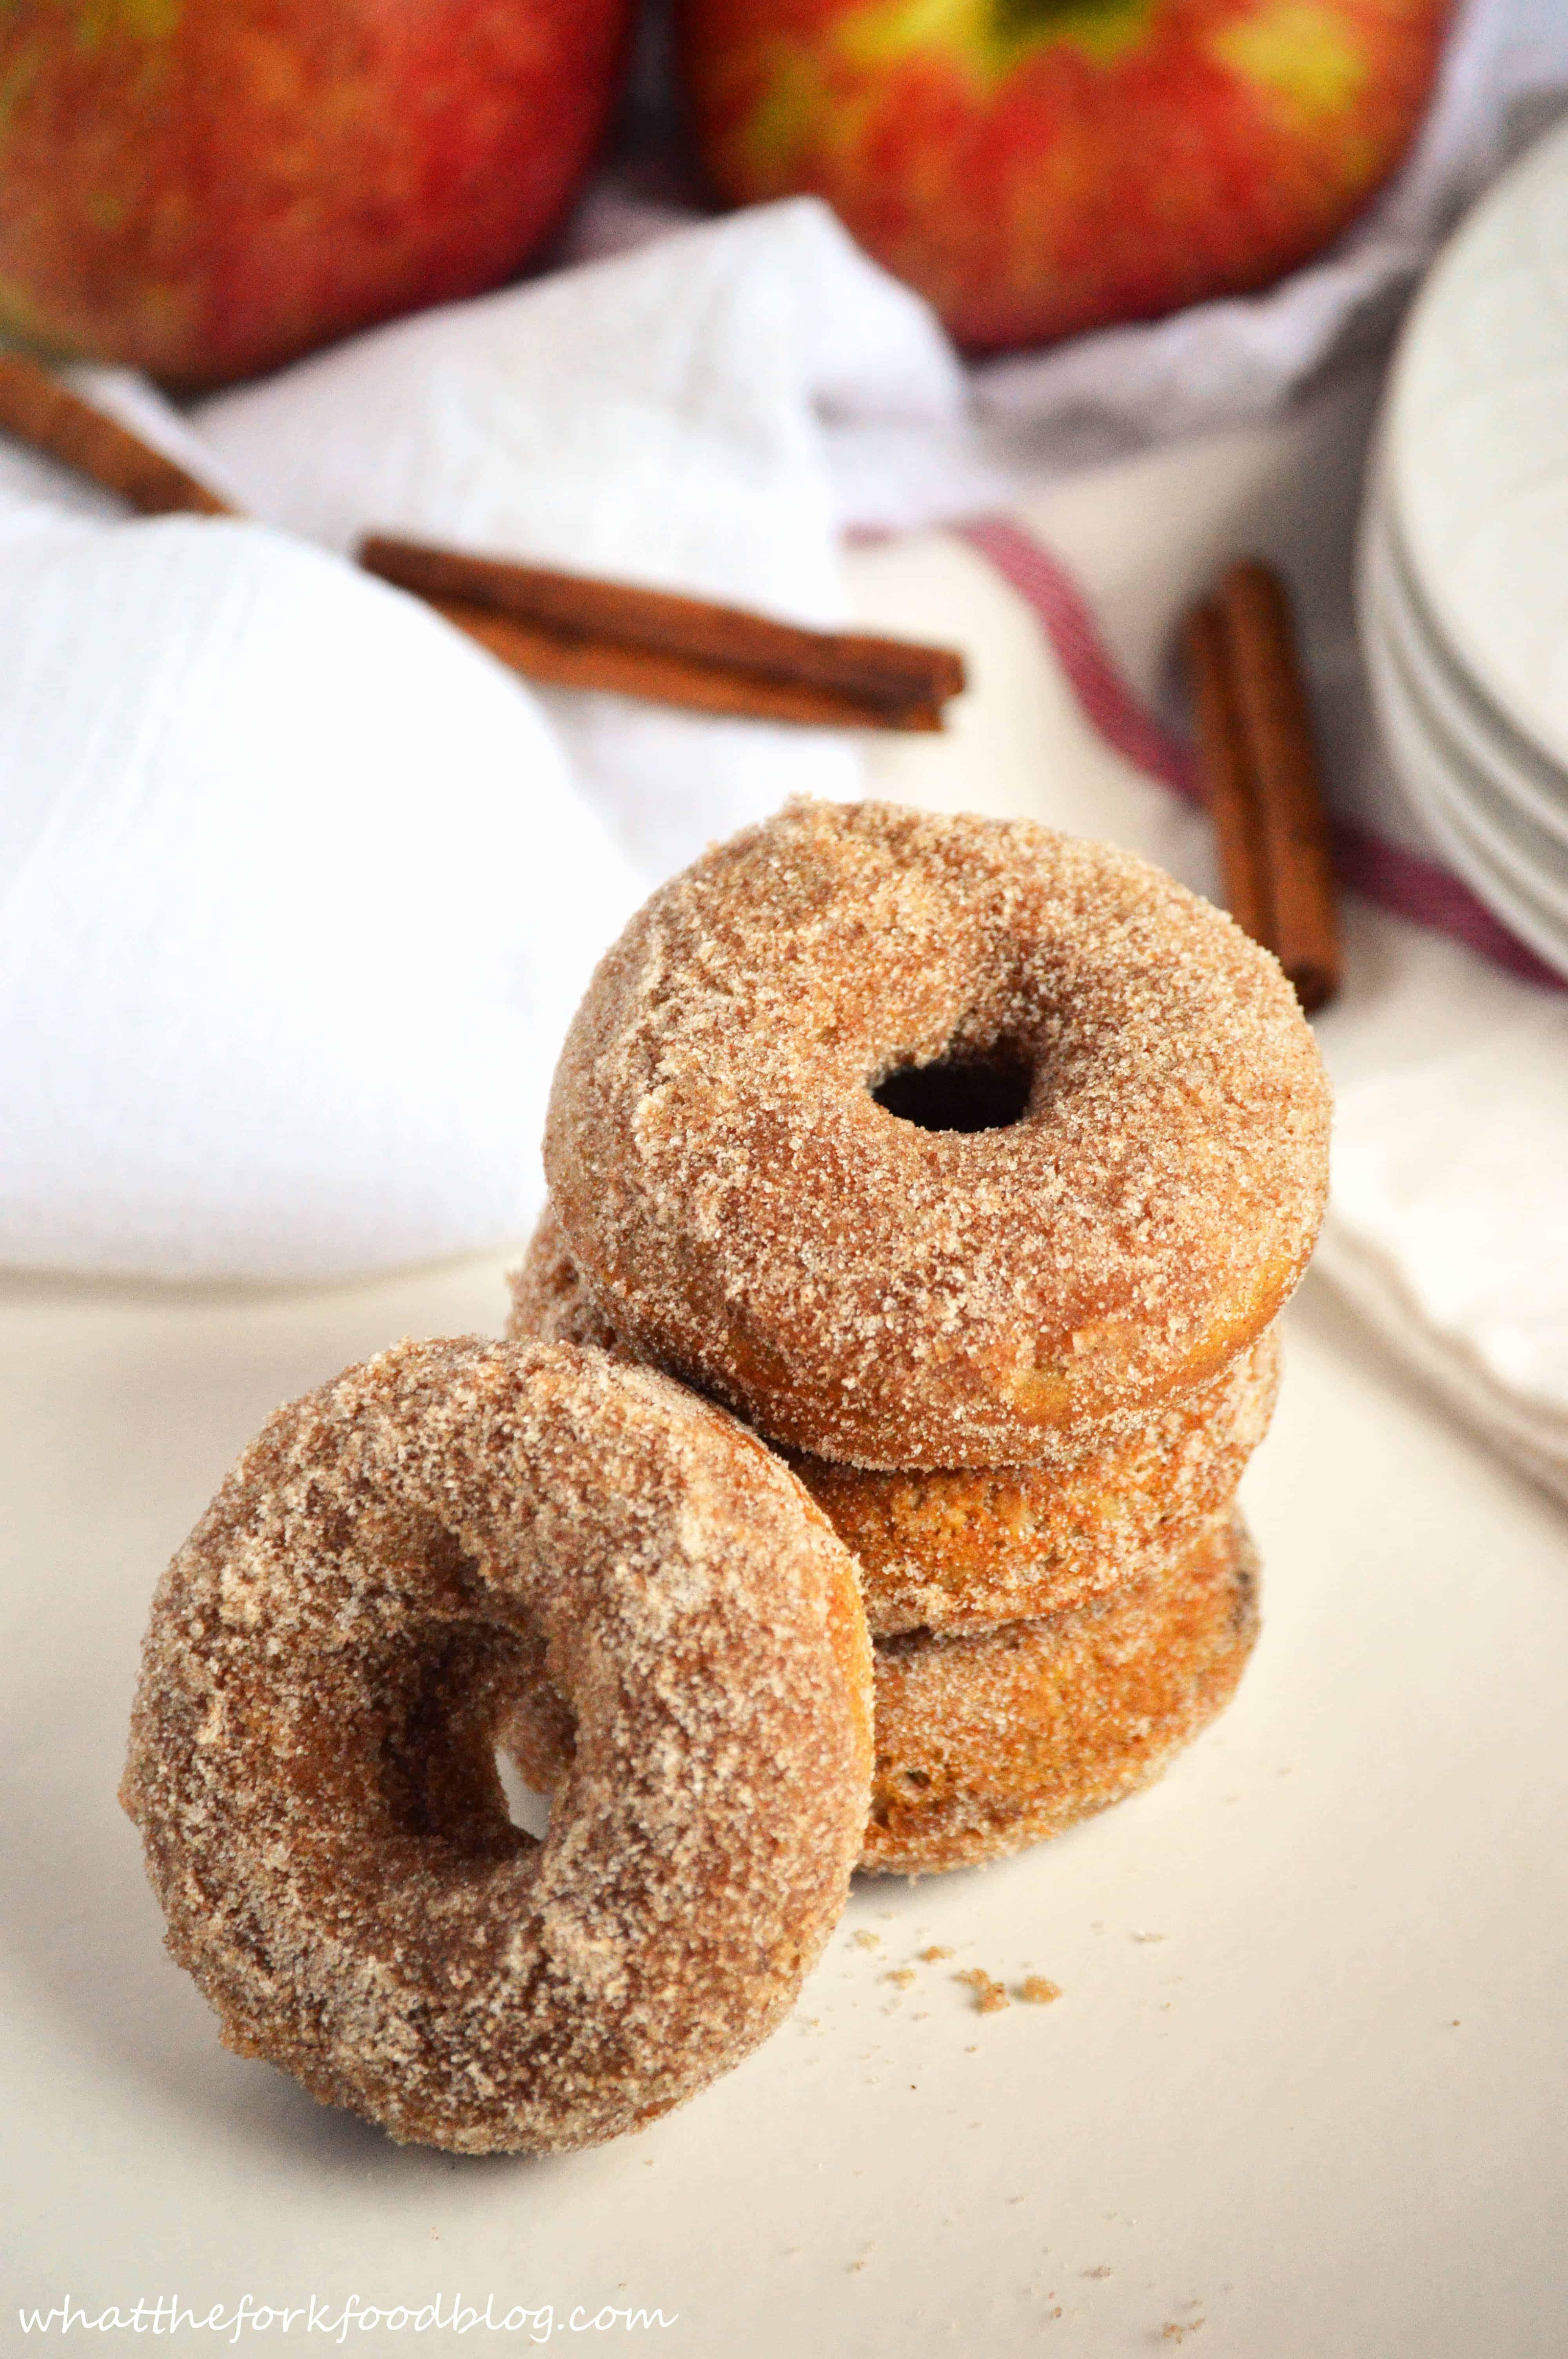 Apple Cider Donuts - What the Fork Food Blog